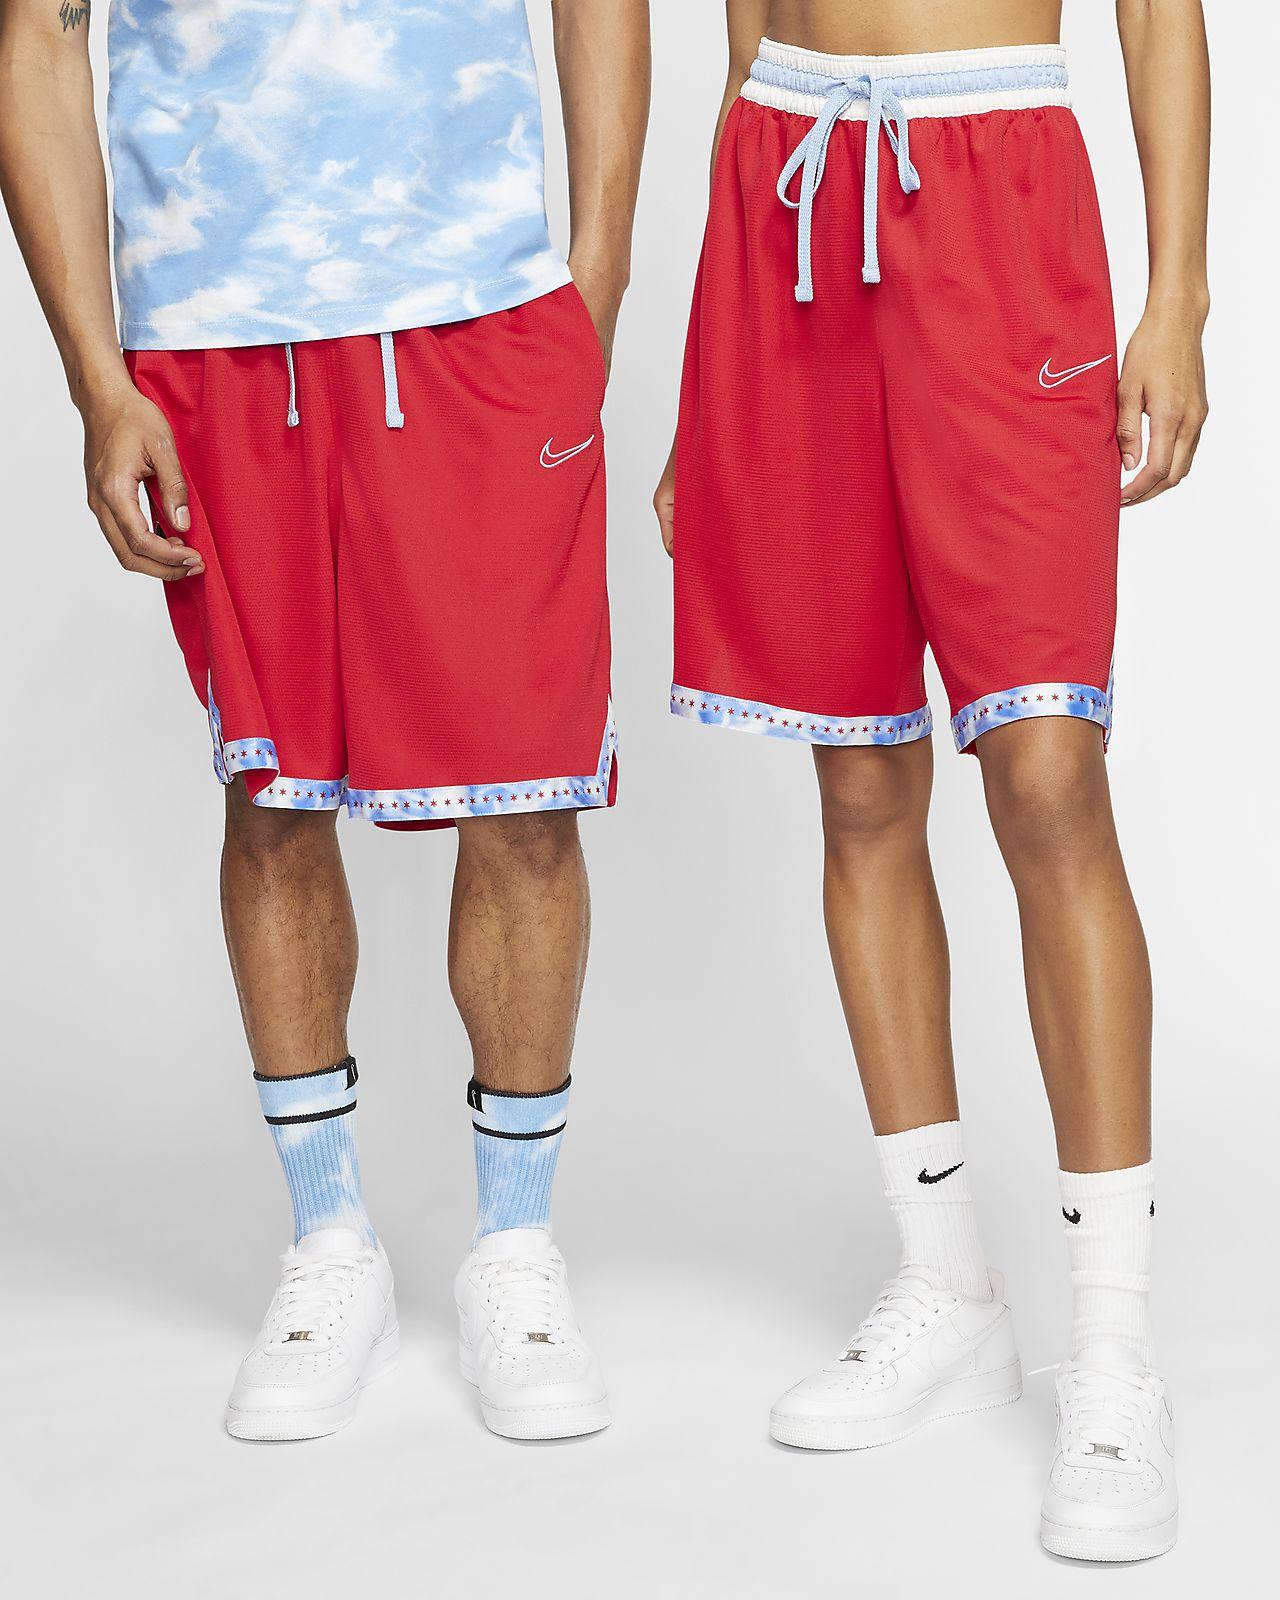 Nike Dri-Fit Men/'s SZ M DNA Zip Pocket Red//Black Basketball Shorts Training